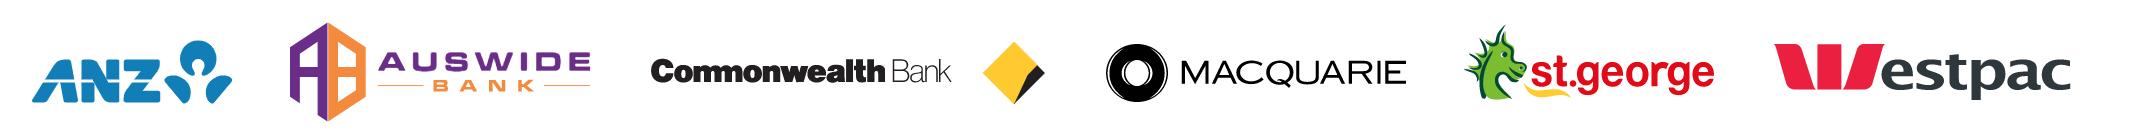 Brands Logos Banner